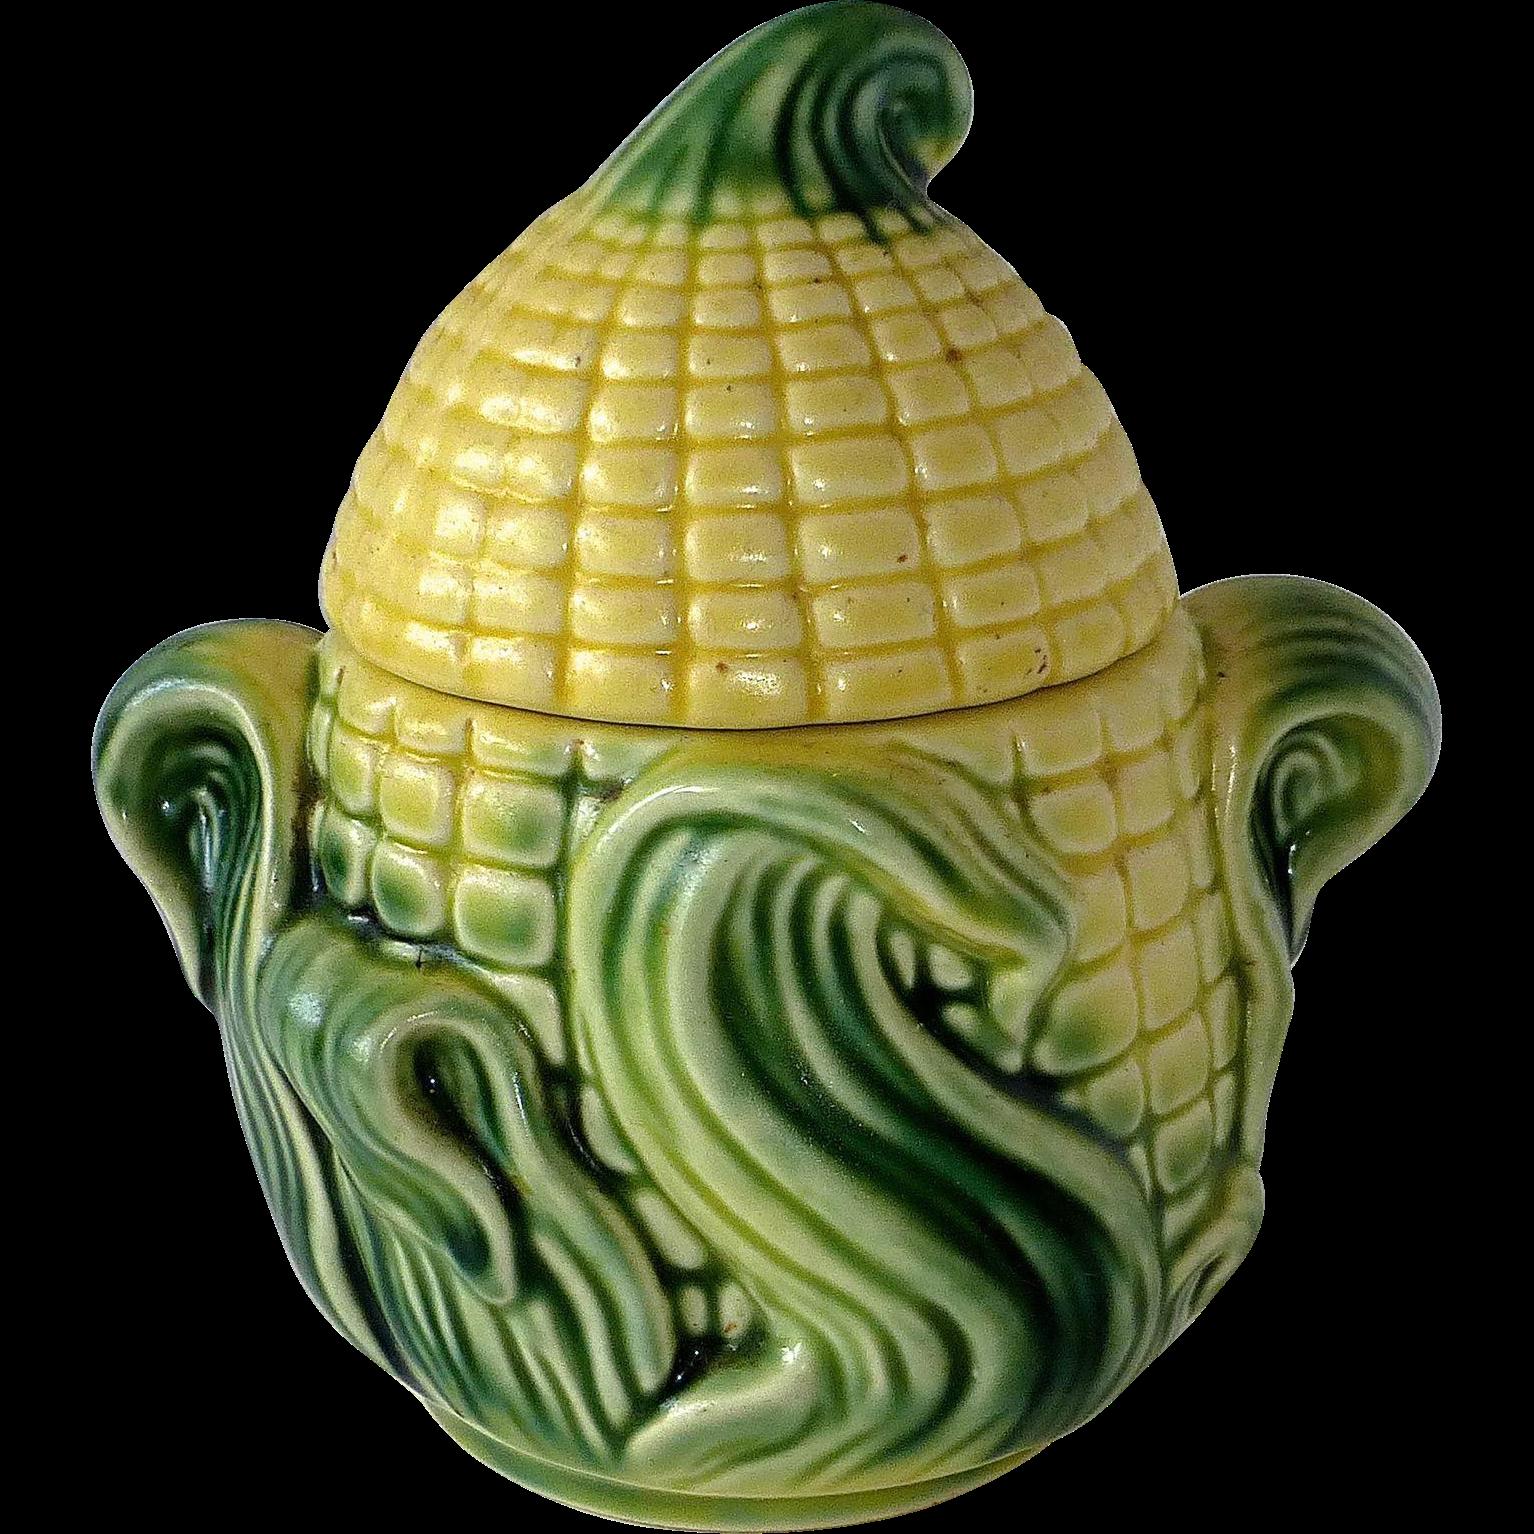 Figural Corn Ceramic Lidded Sugar Bowl